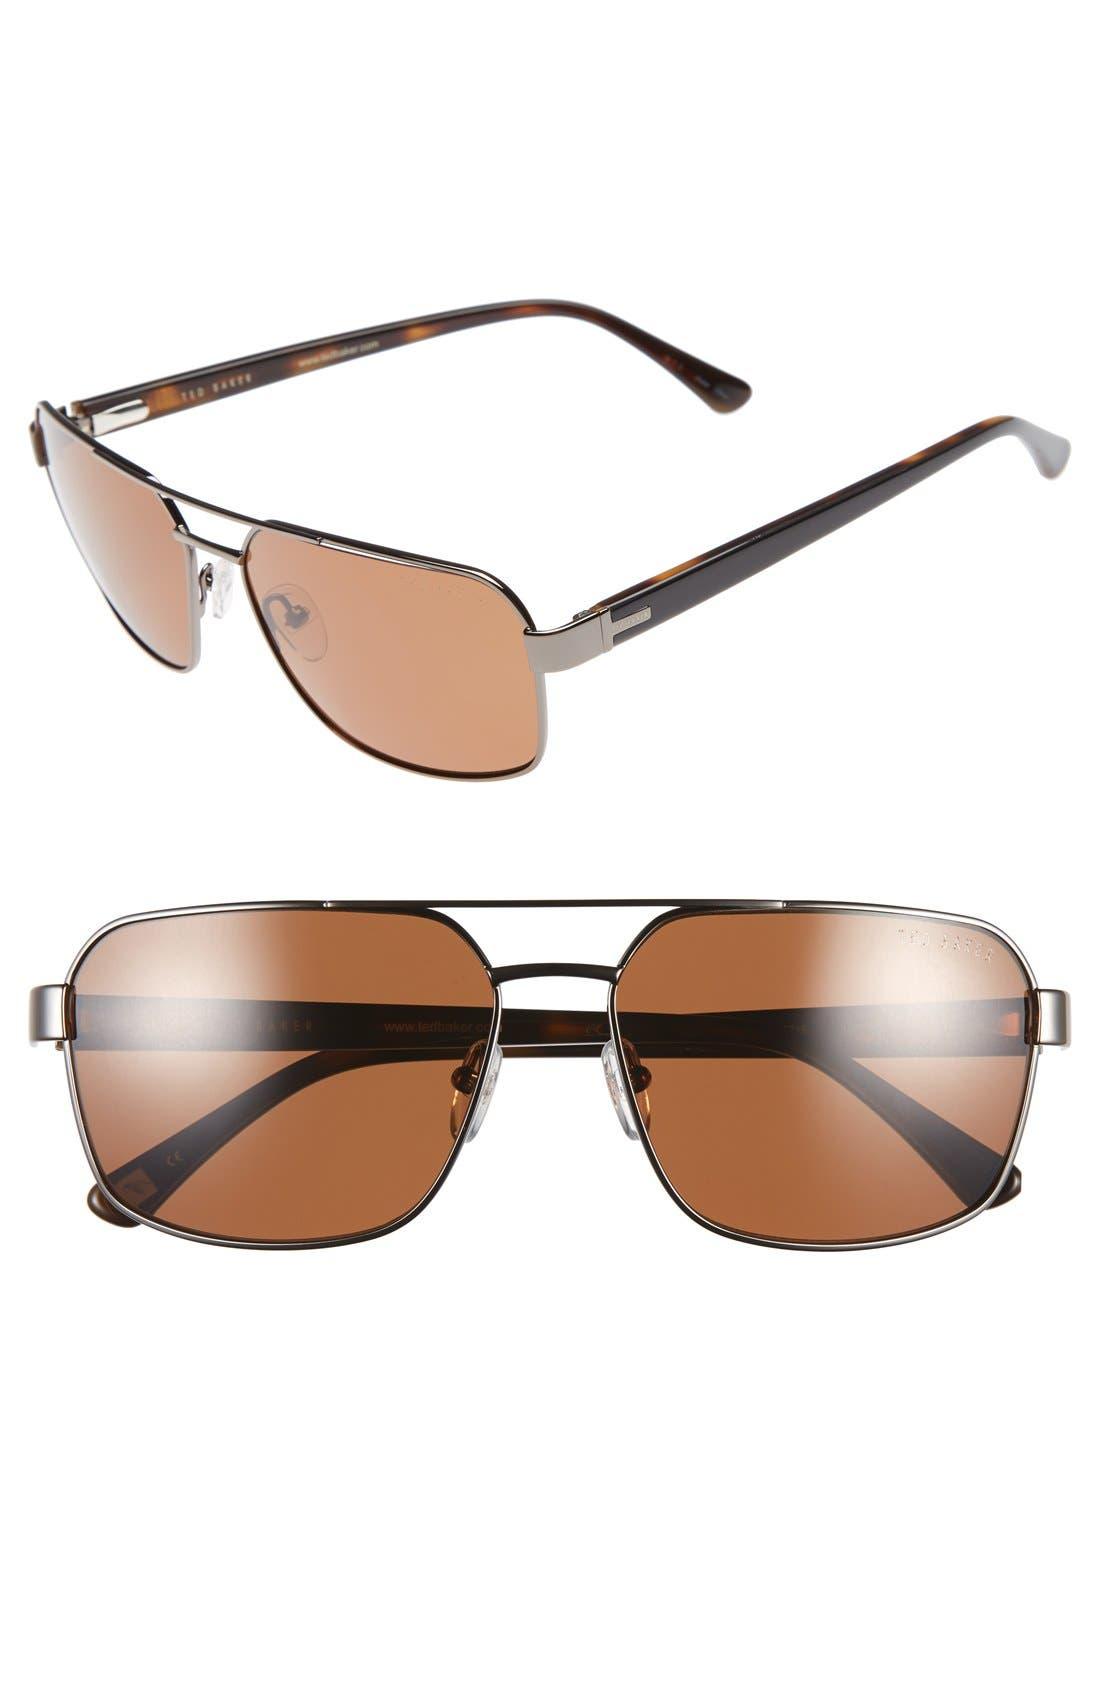 59mm Polarized Navigator Sunglasses,                         Main,                         color, 241